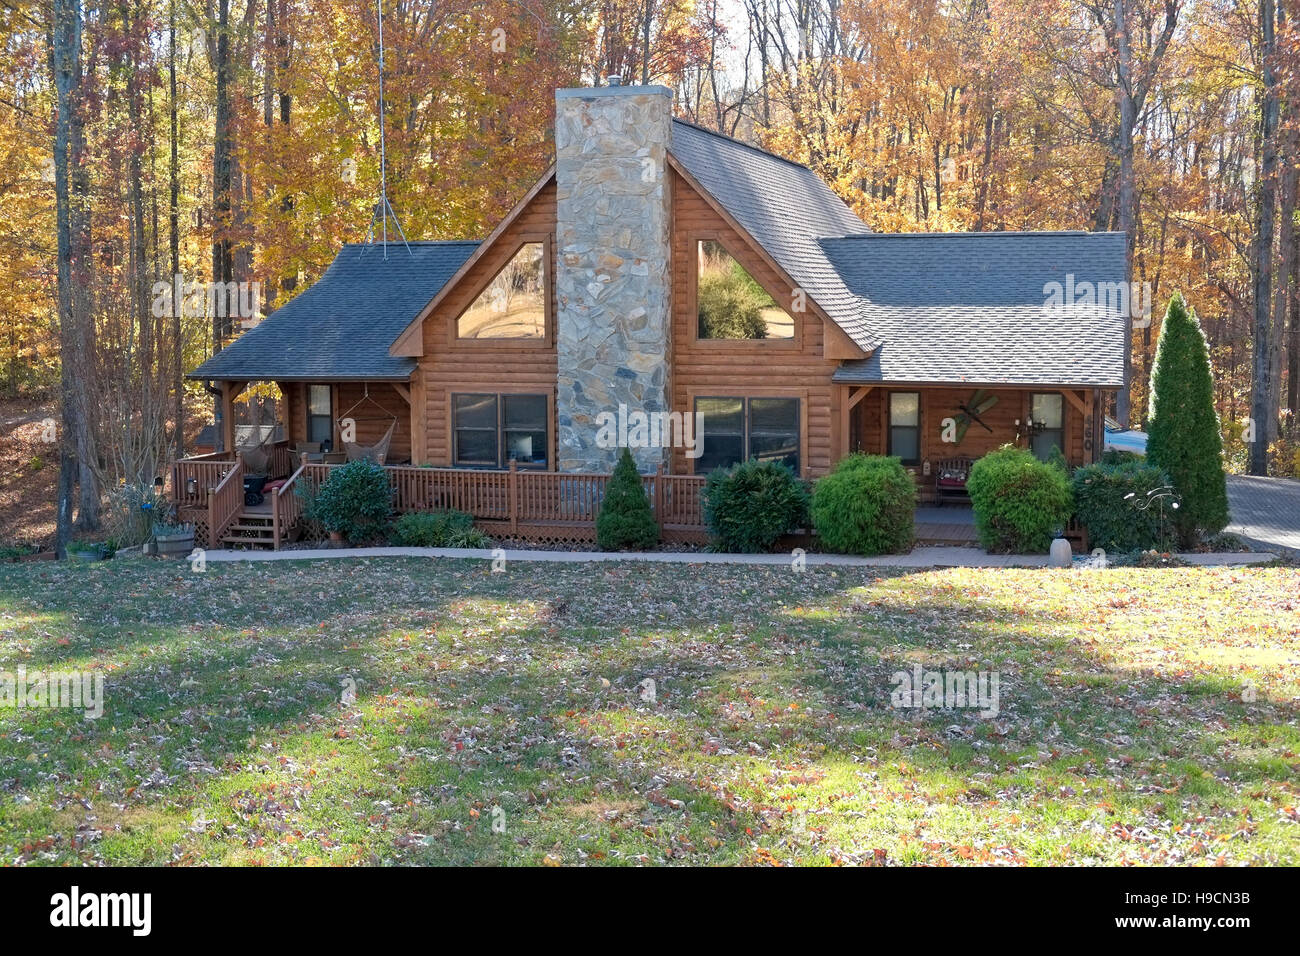 Log cabin in North Carolina during Autumn - Stock Image